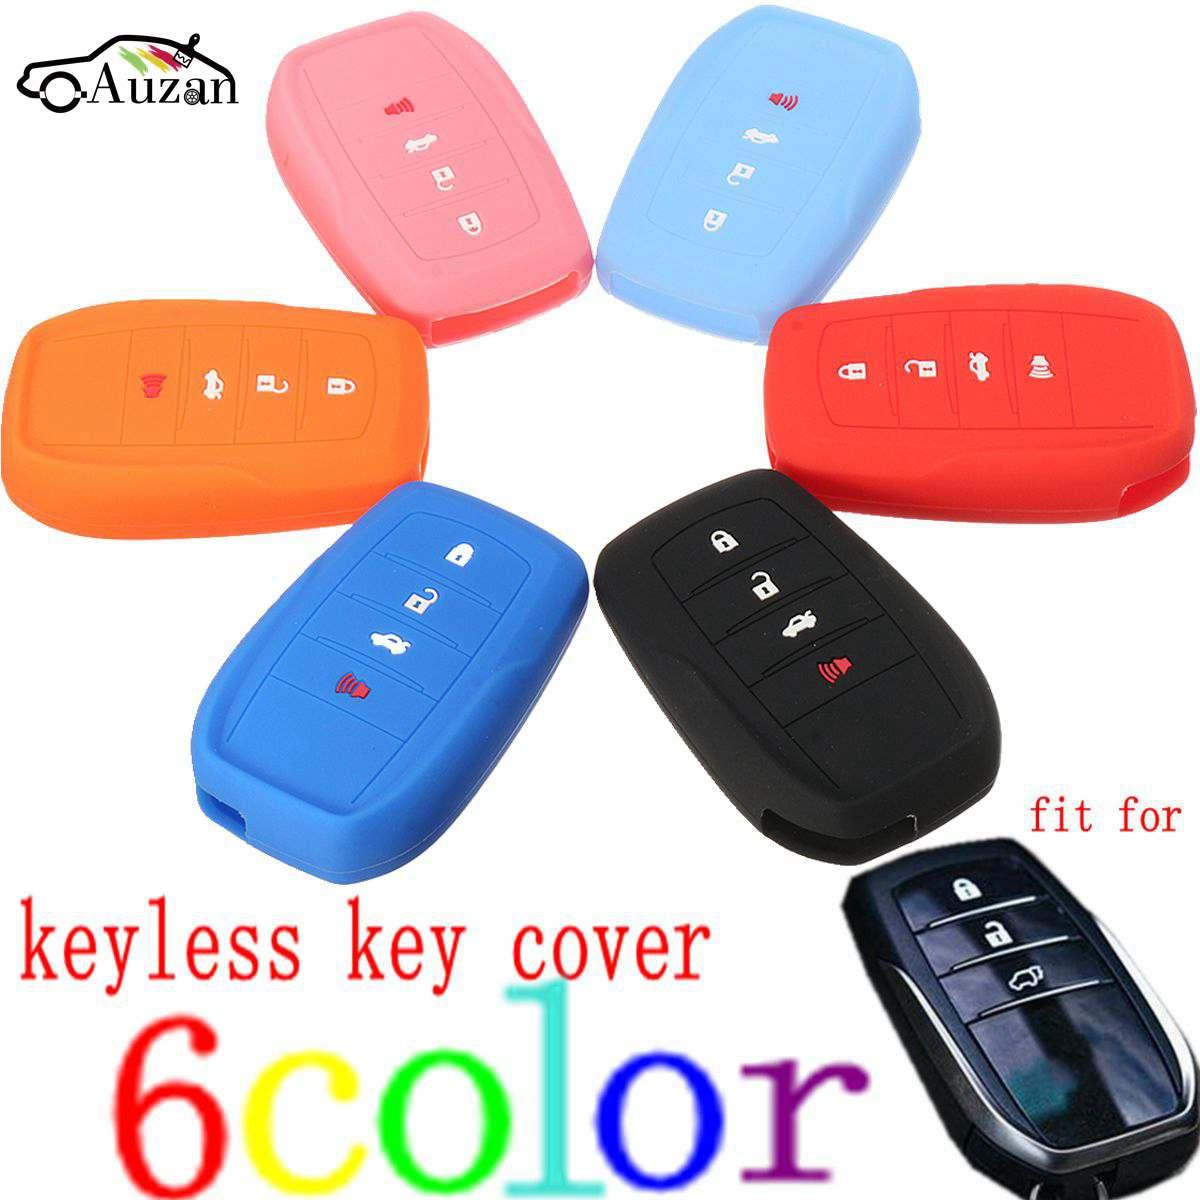 4 Buttons Silicone Cover Fit For Toyota Fortuner Rav4 Highlander Crown Smart Remote Key BK